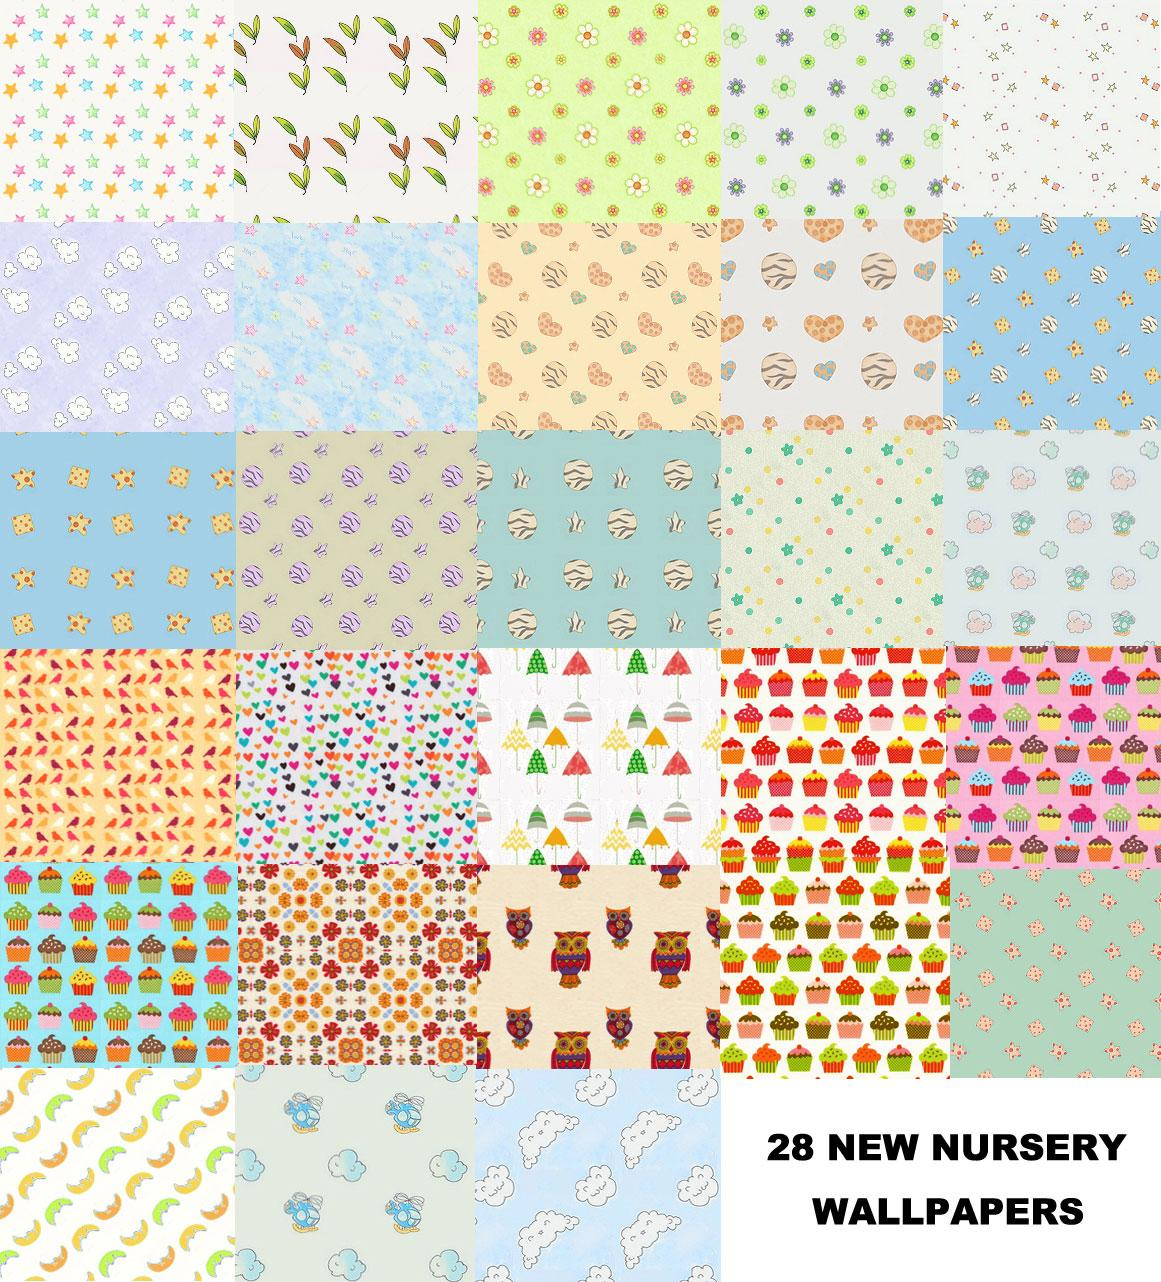 Set of 28 new nursery wallpapers